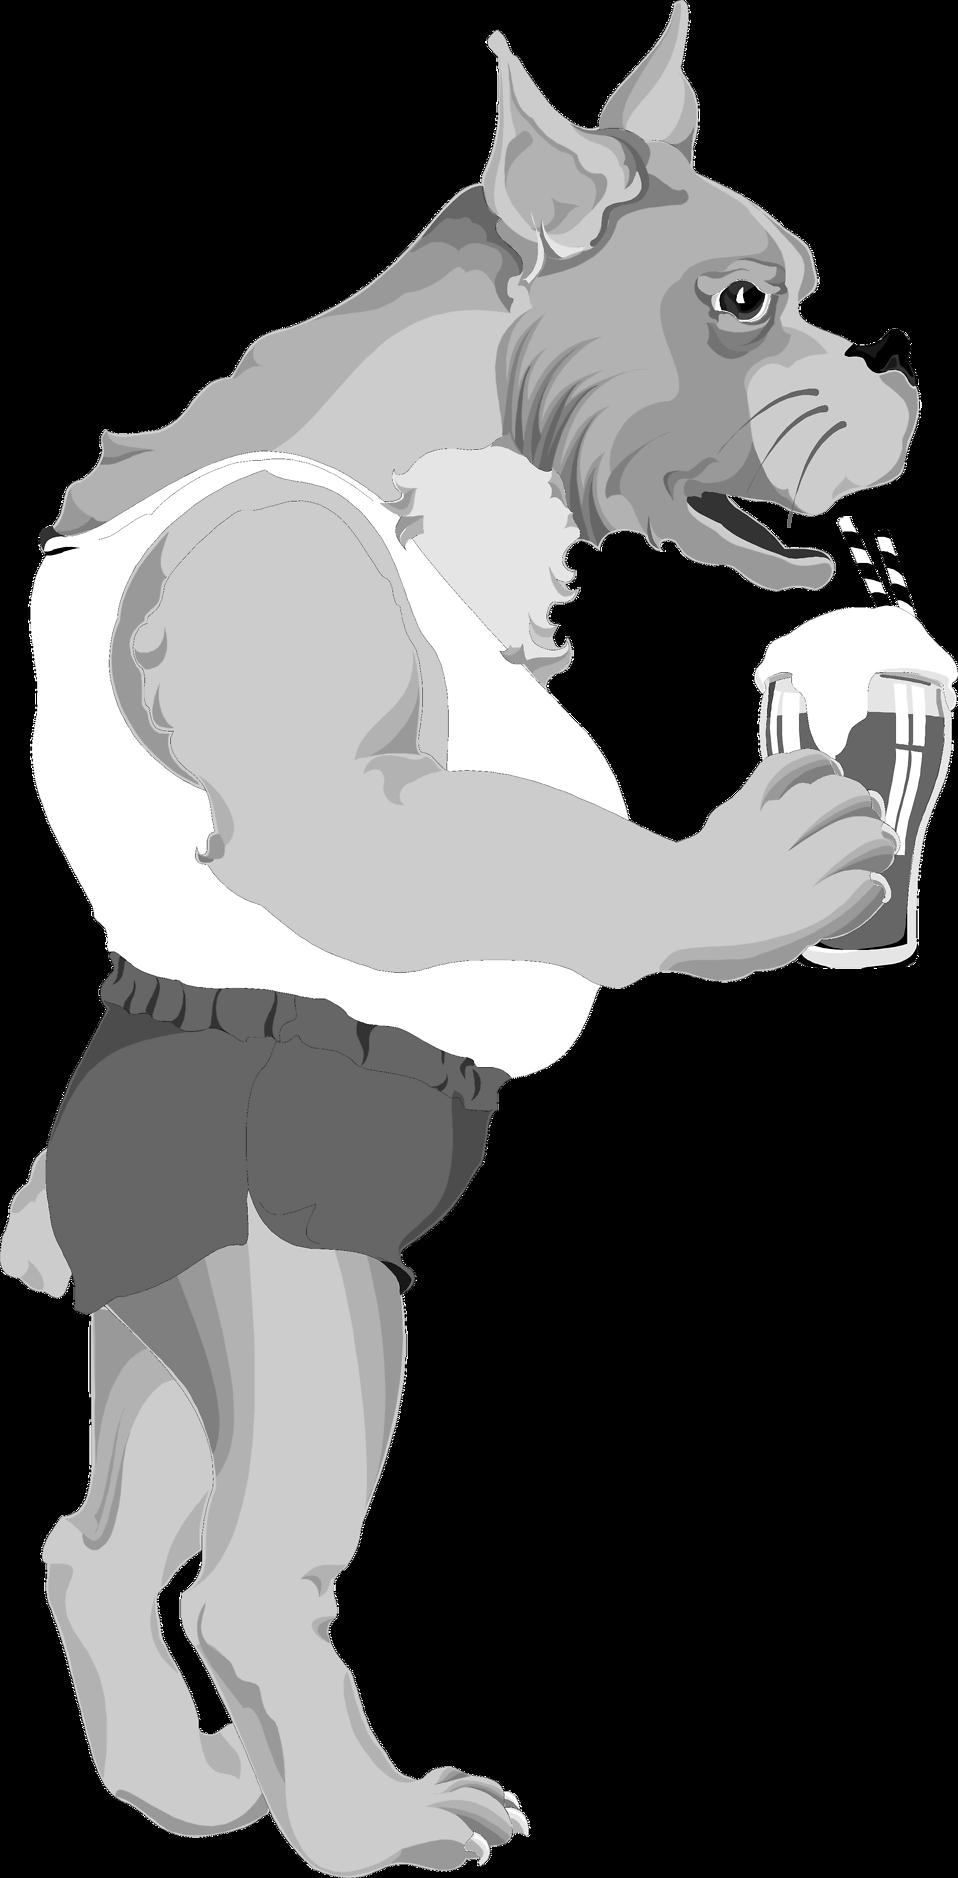 Clip Art Dog Food. Illustration of a dog drinking